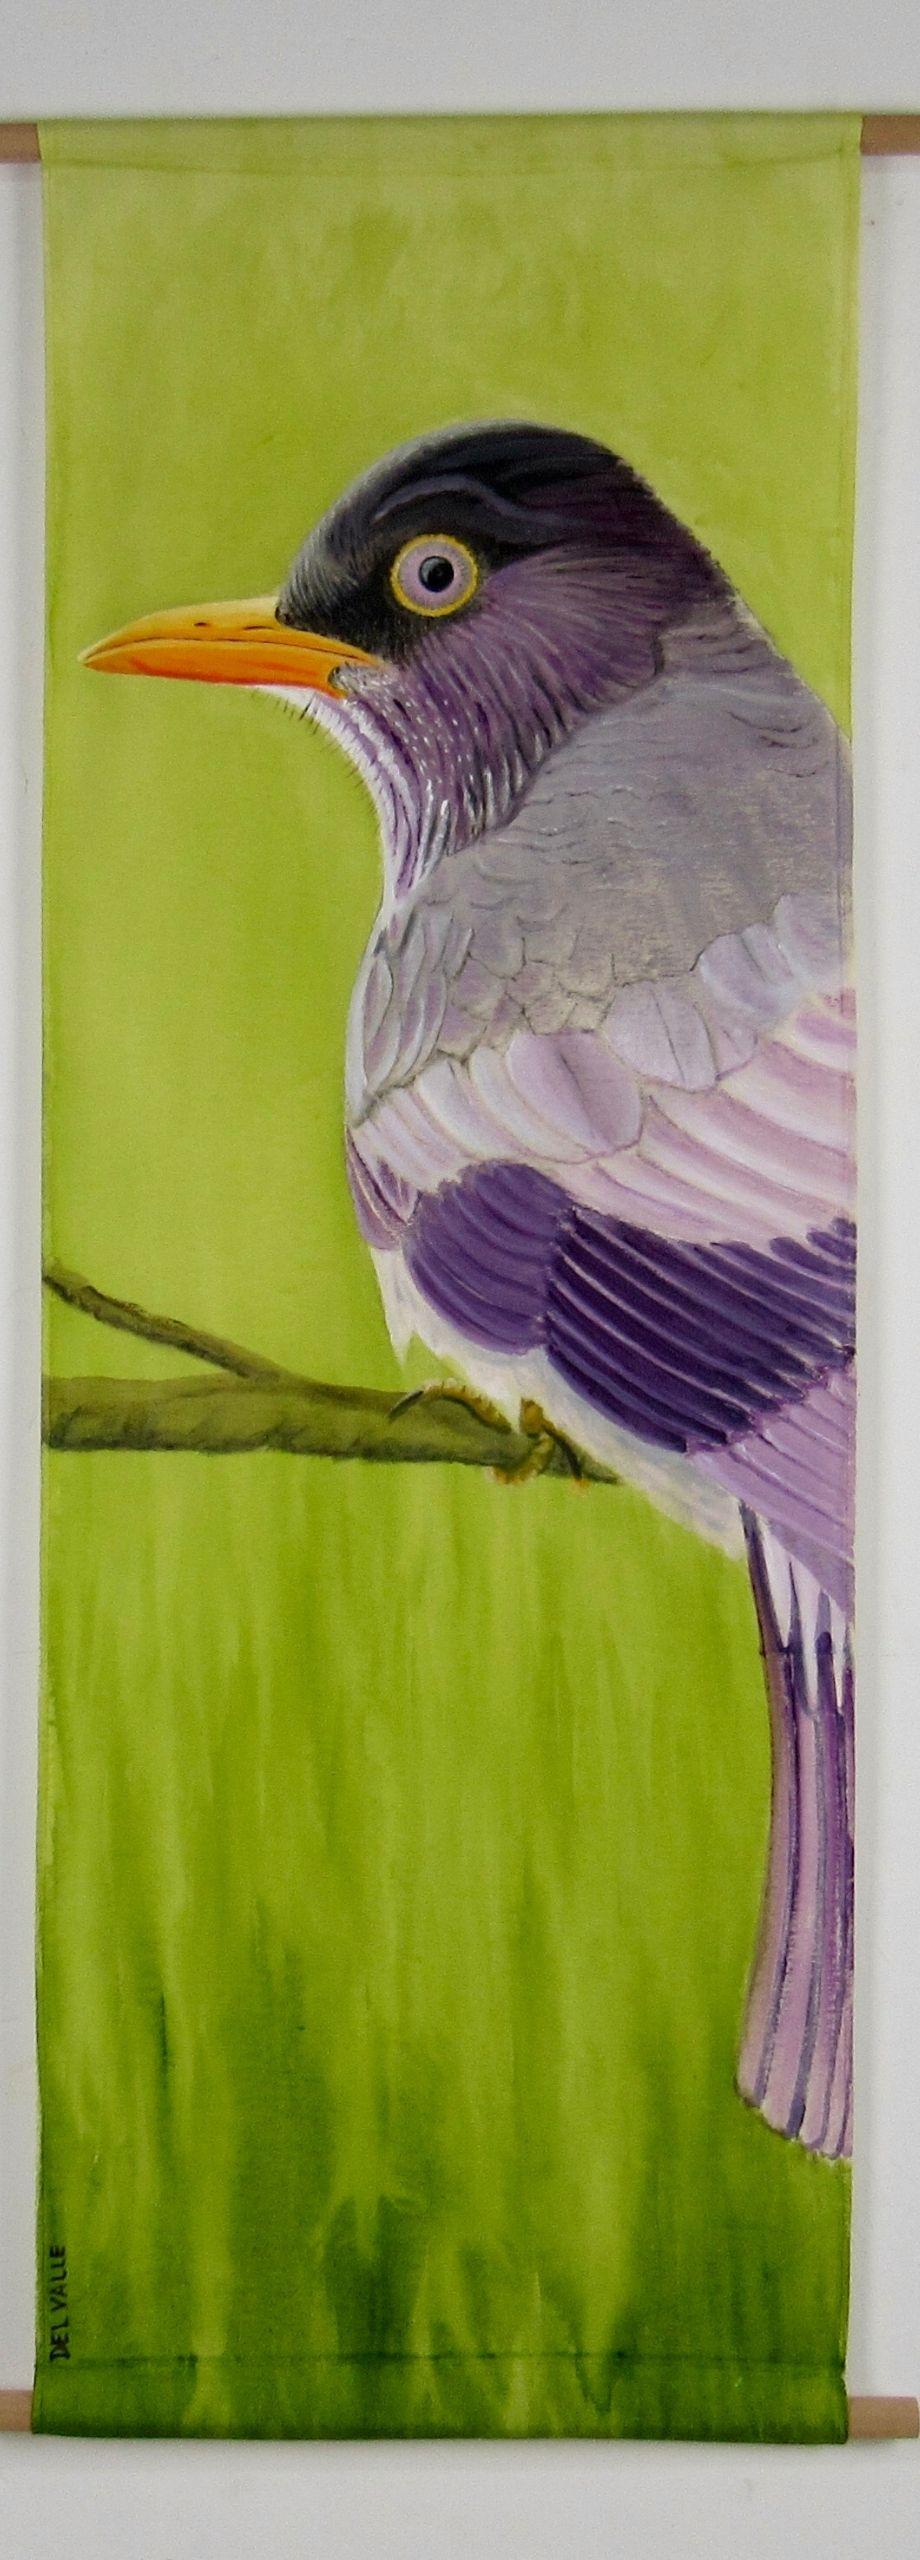 Patagonian thrush bird (135 x 45 cm)